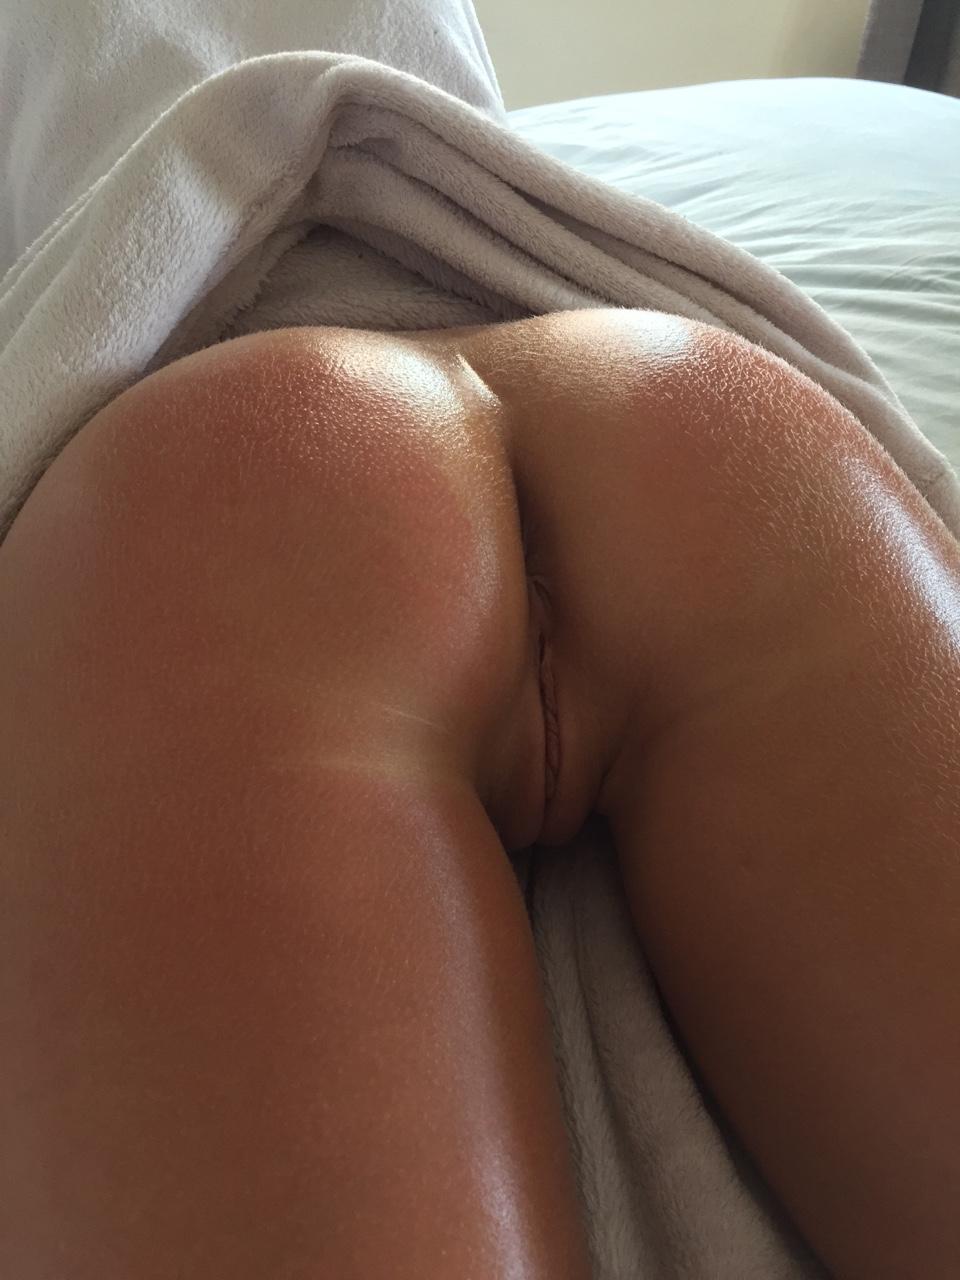 maria ozawa massage streaming porn watch and download maria